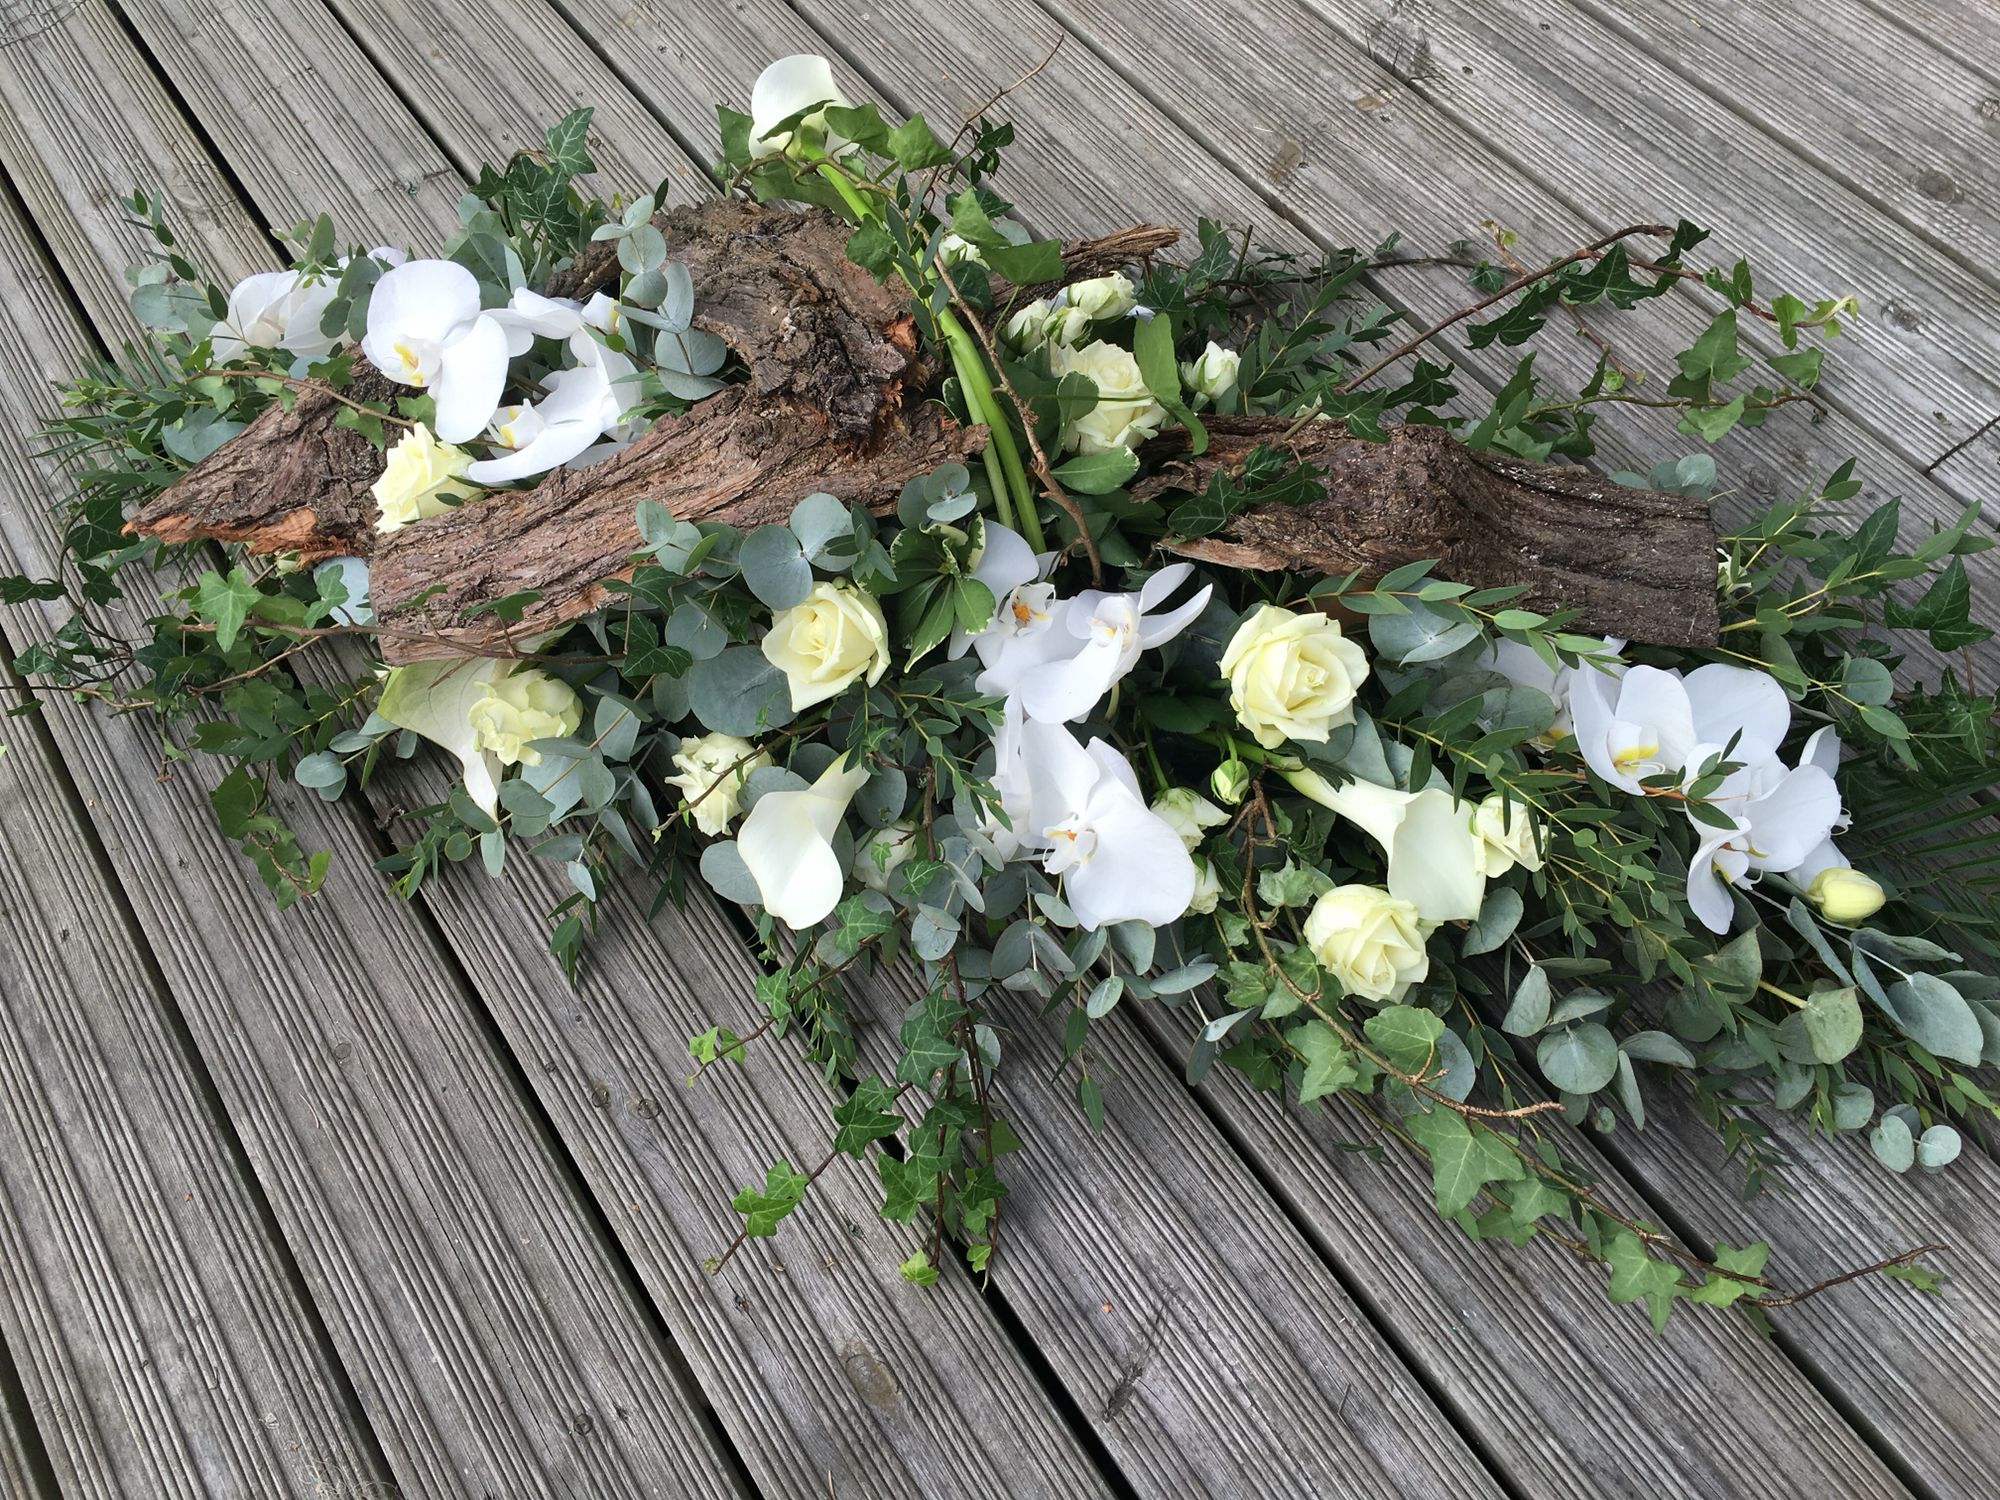 Woodland flowers rustic funeral flowers thefloralartstudio woodland flowers rustic funeral flowers thefloralartstudio izmirmasajfo